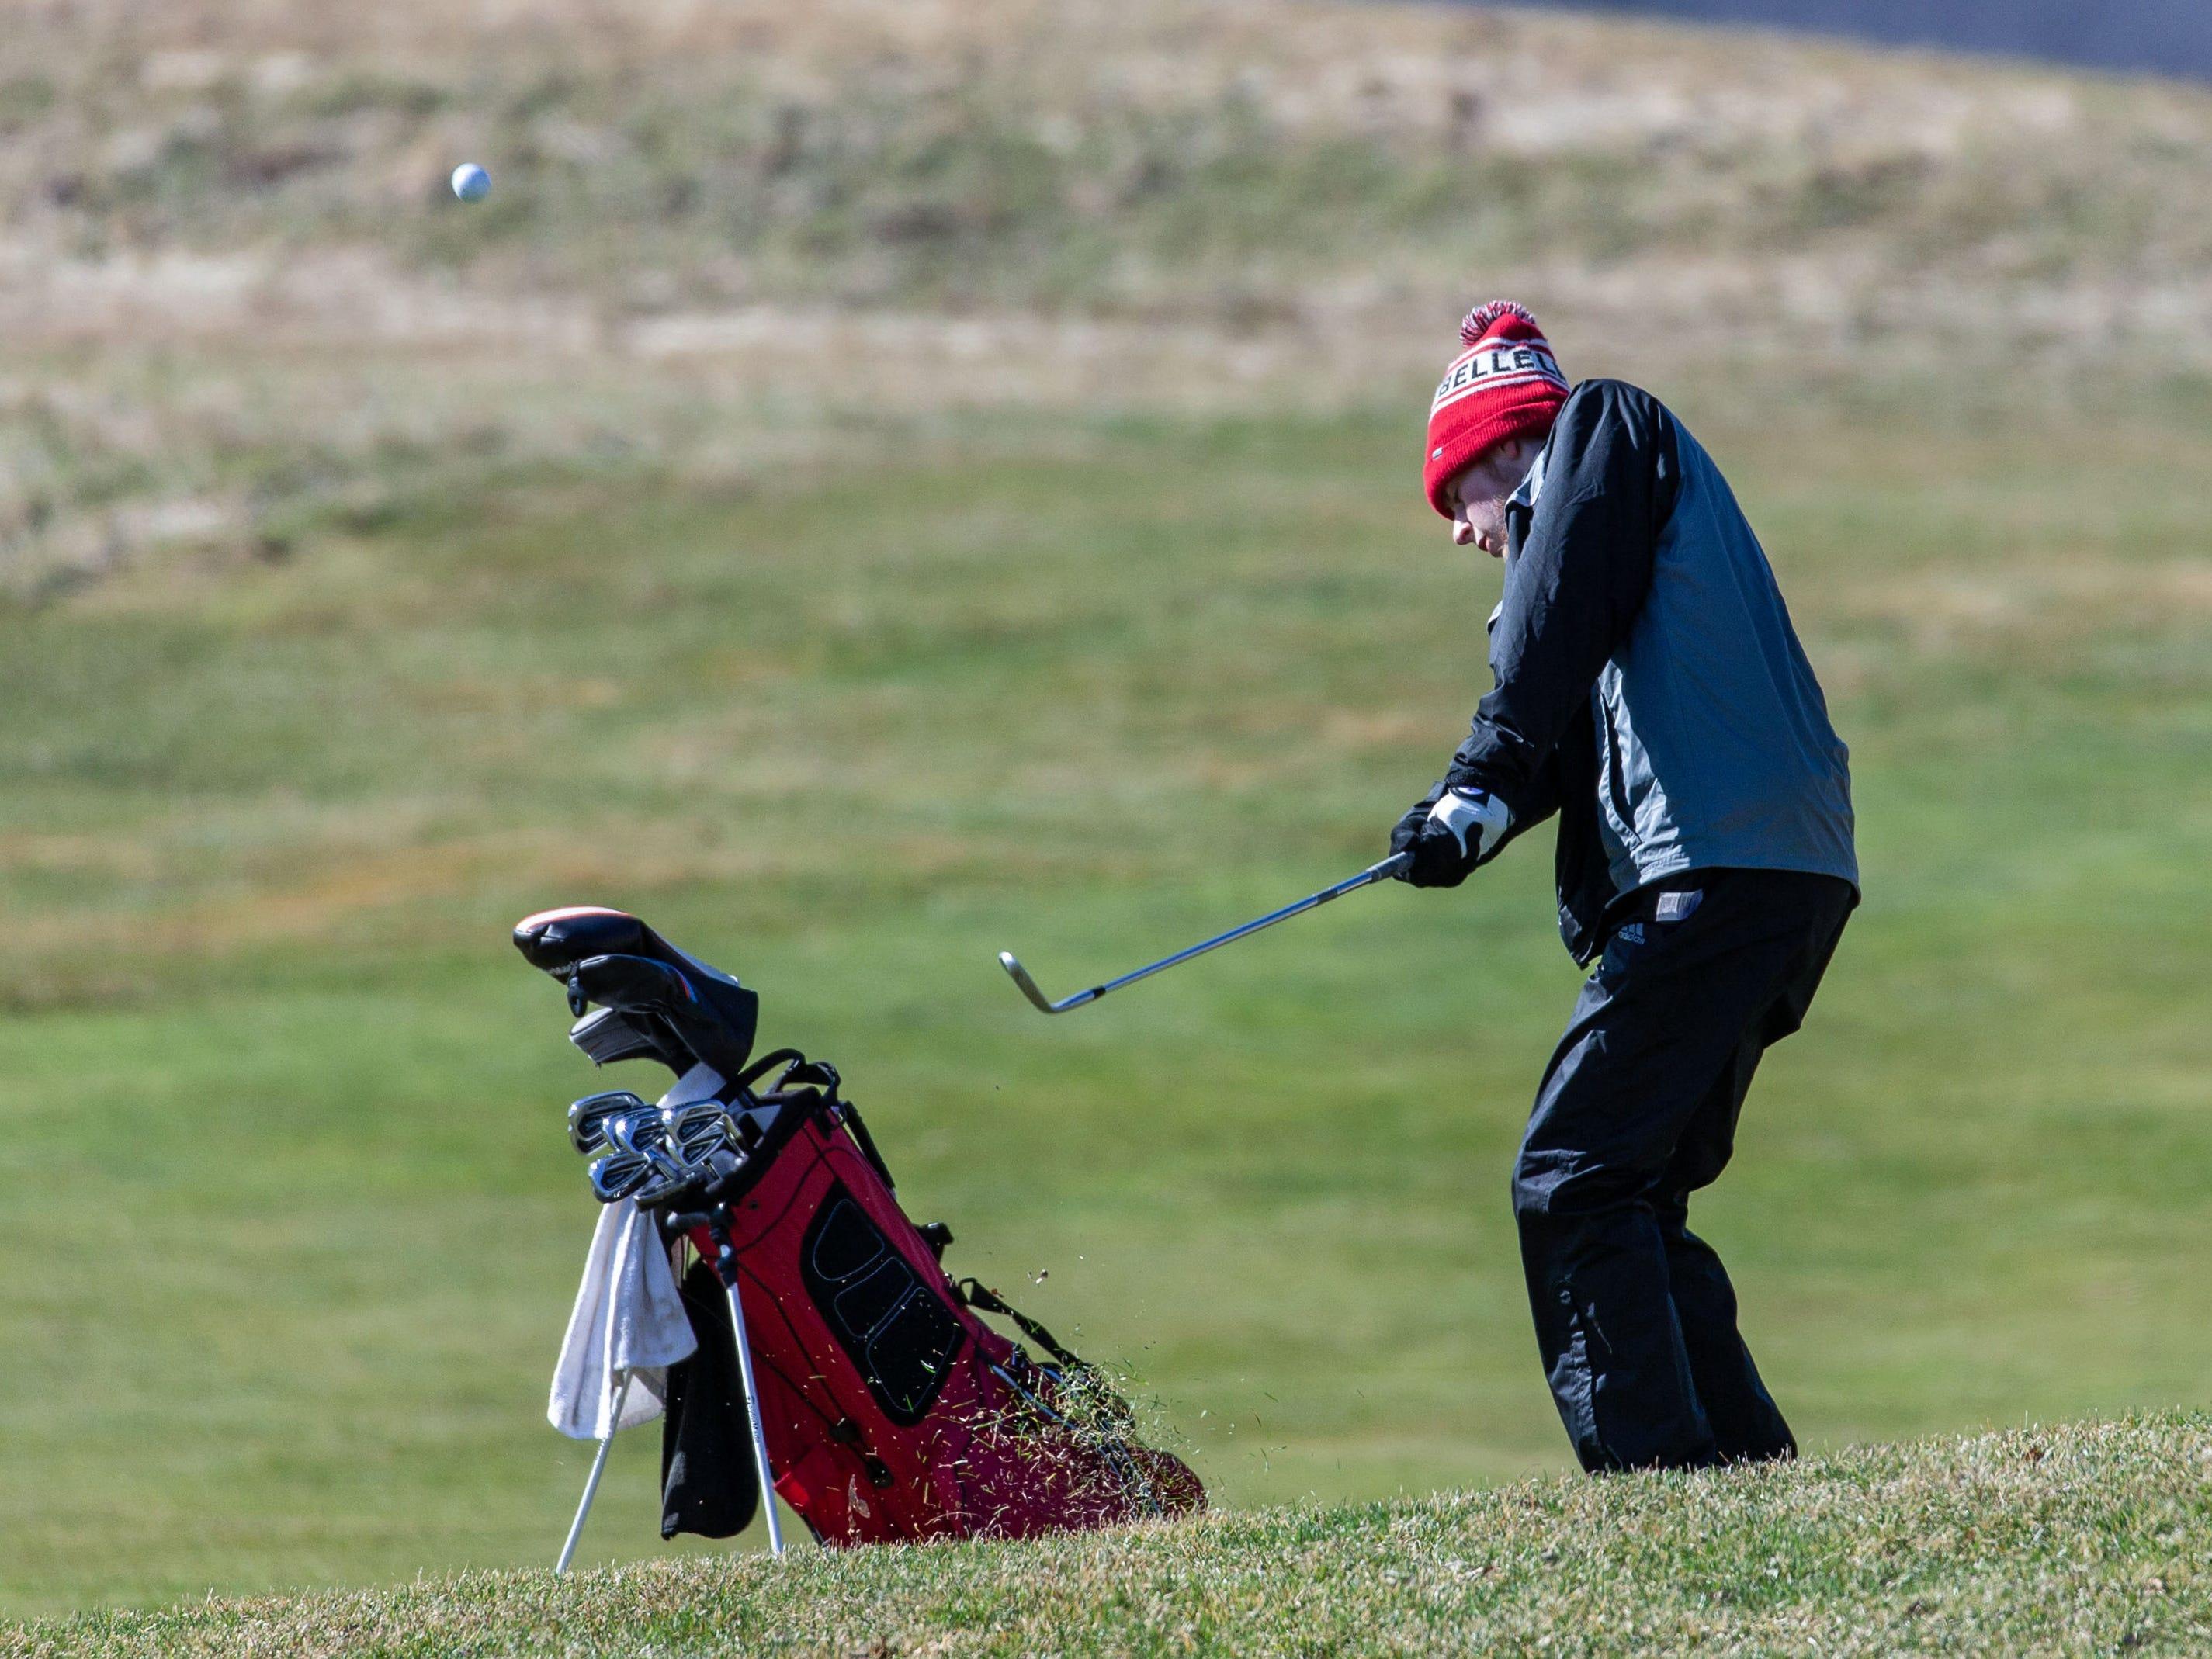 Pewaukee golfer Alex Lee competes in the Catholic Memorial 2019 Crusader Invitational at Broadlands Golf Club in North Prairie on Saturday, April 13, 2019.